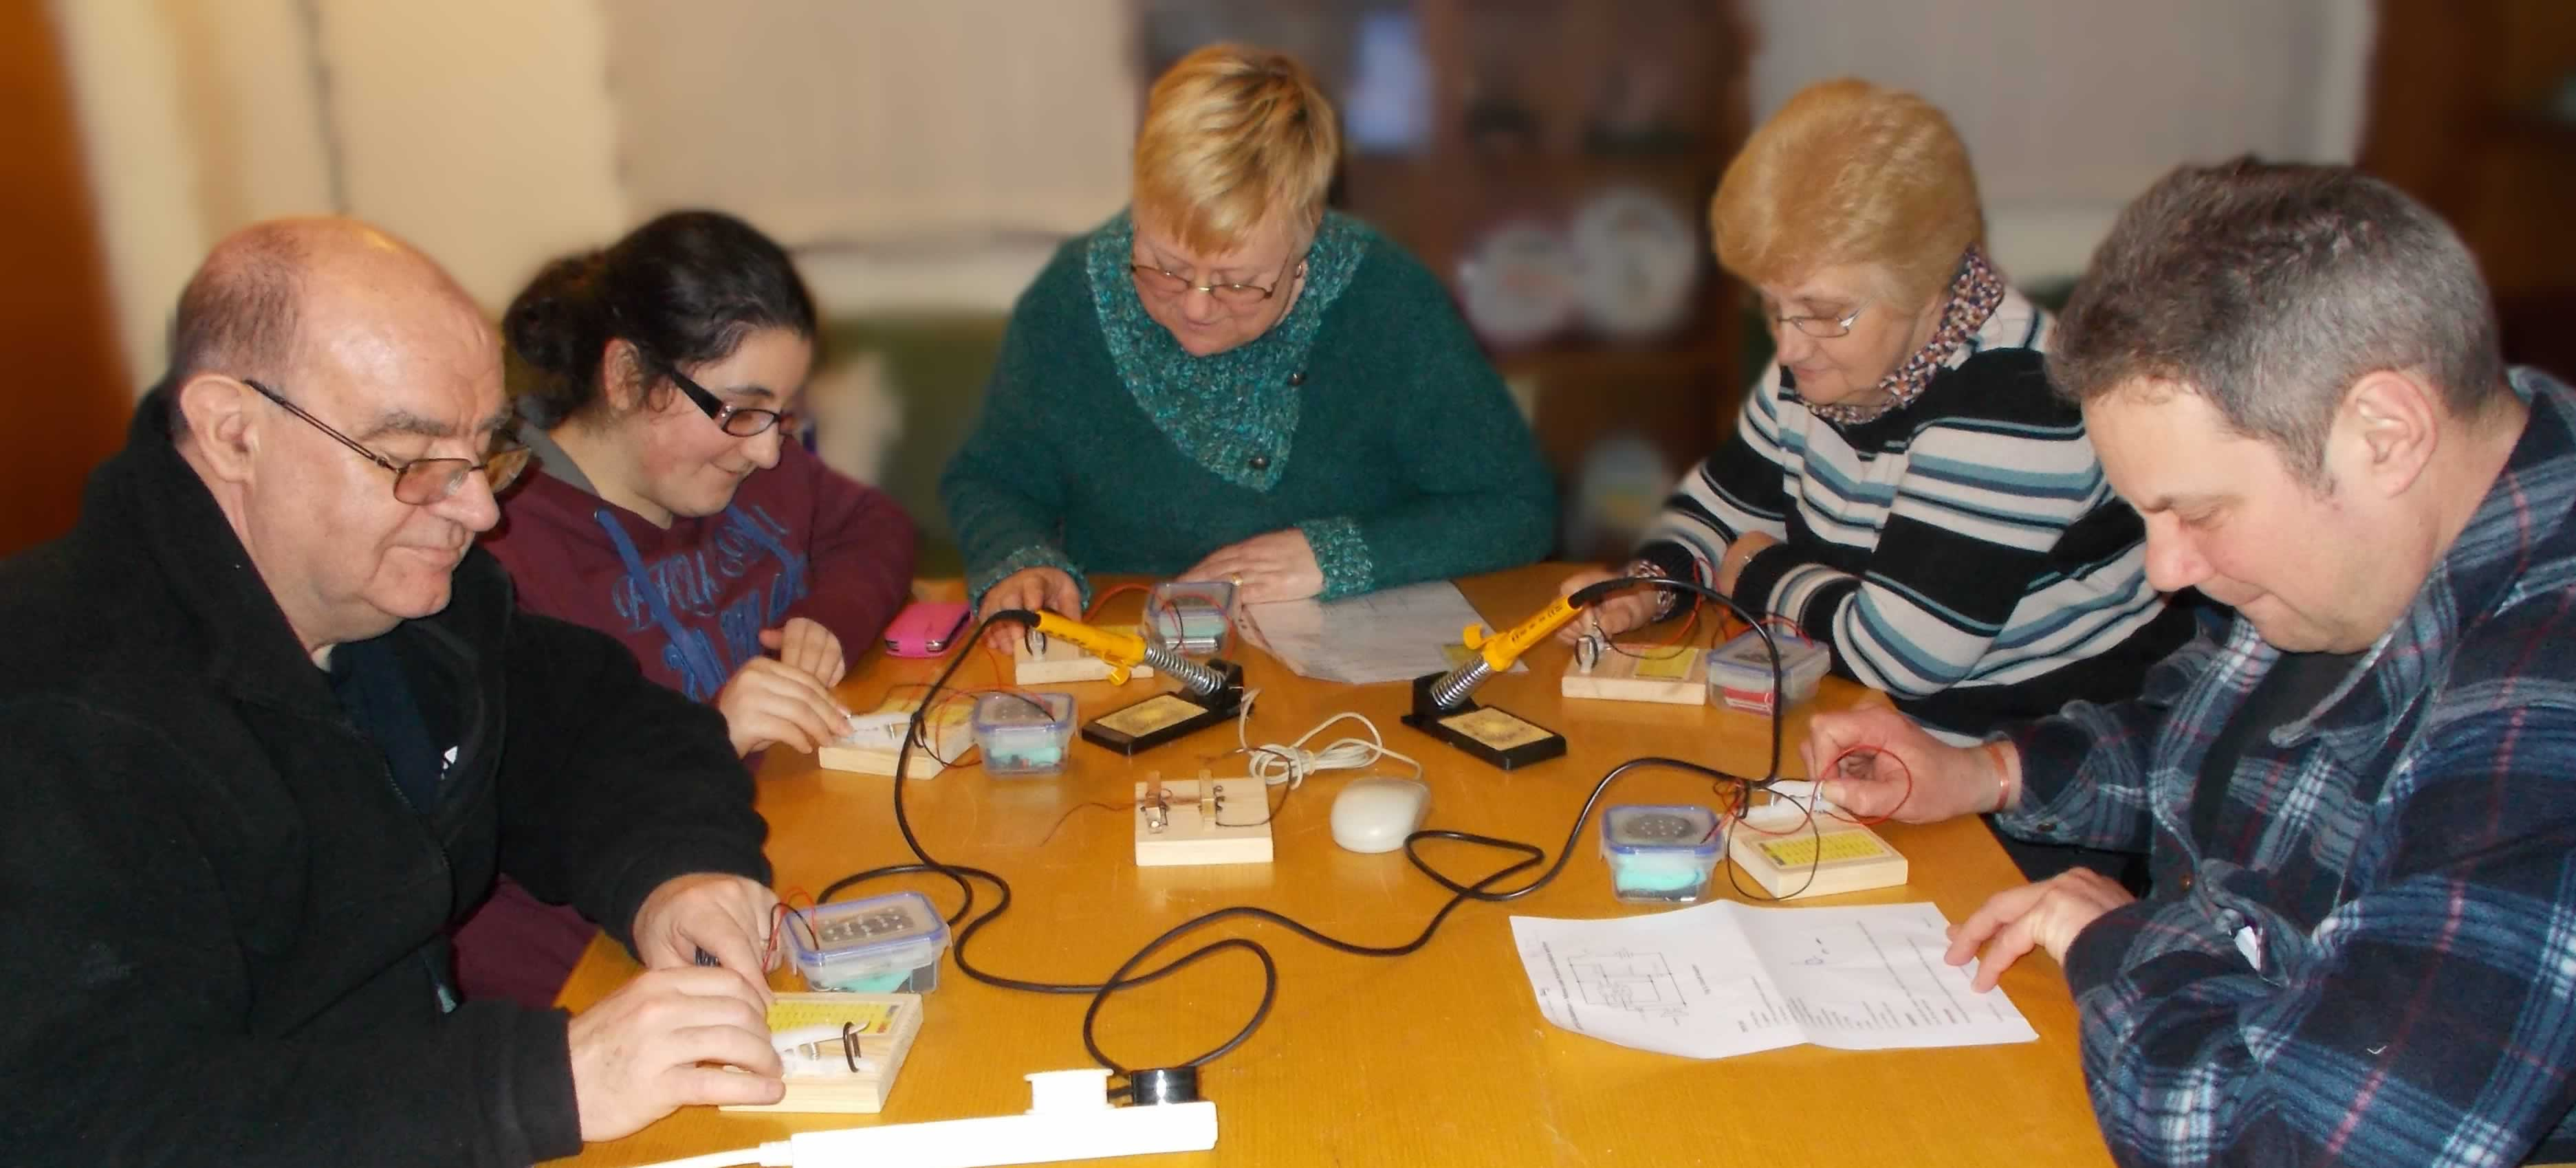 Cw Practice Oscillator Electronic Circuits And Diagramelectronics